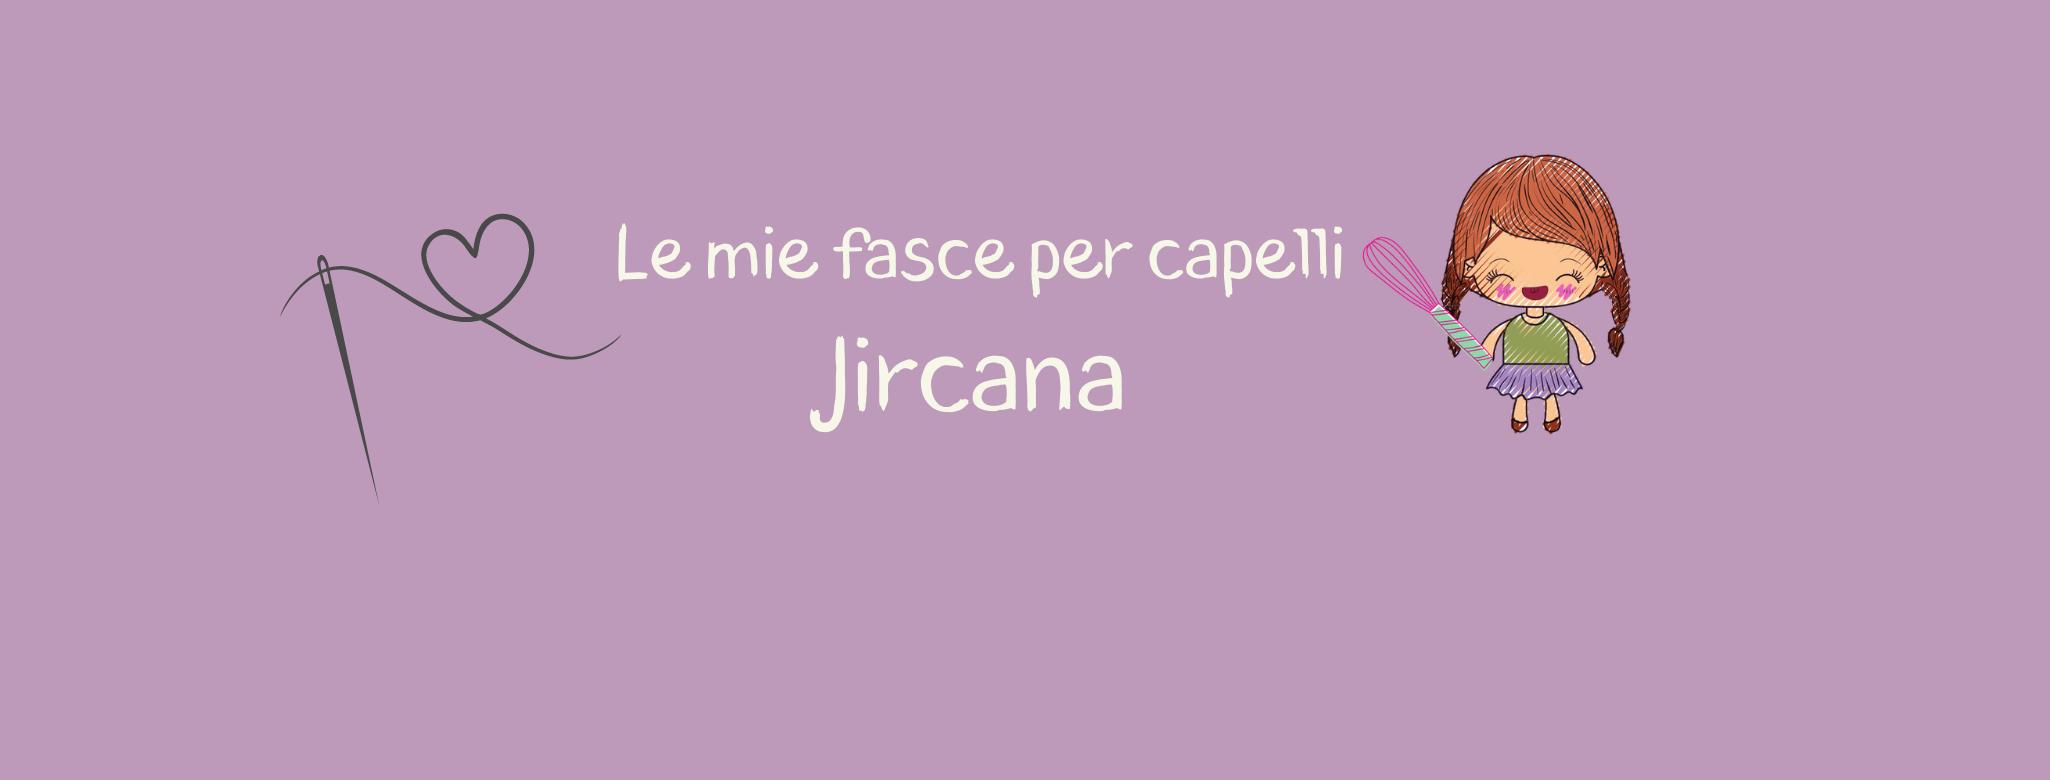 FASCE_PER_CAPELLI